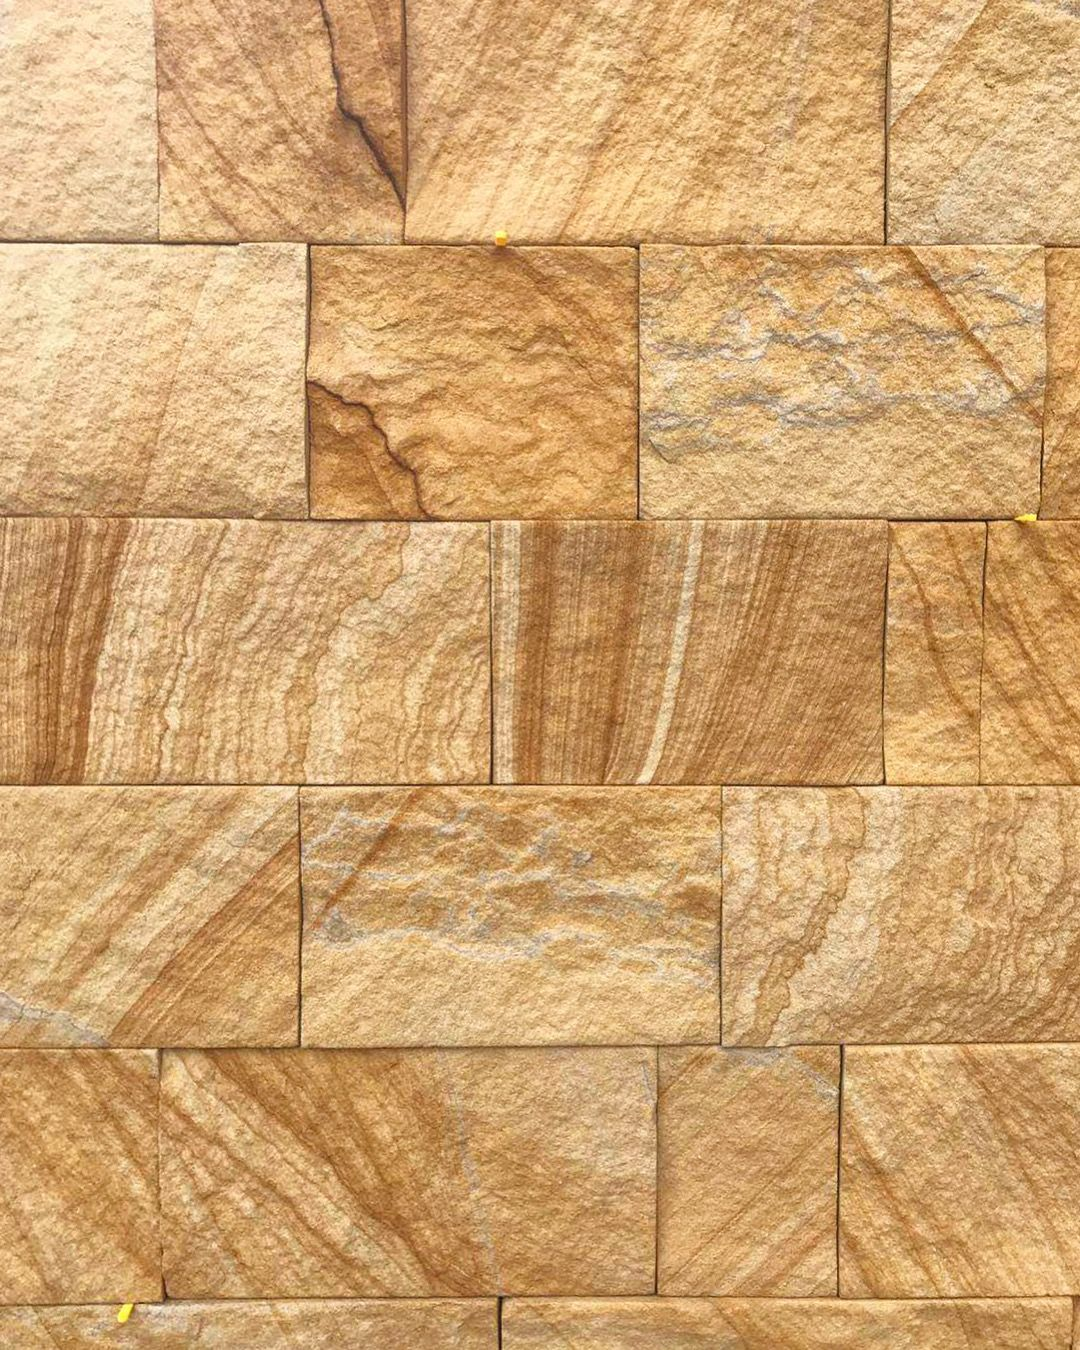 Sandstone Wall Sandstone Walls Sandstone Walling Sandstone Wall